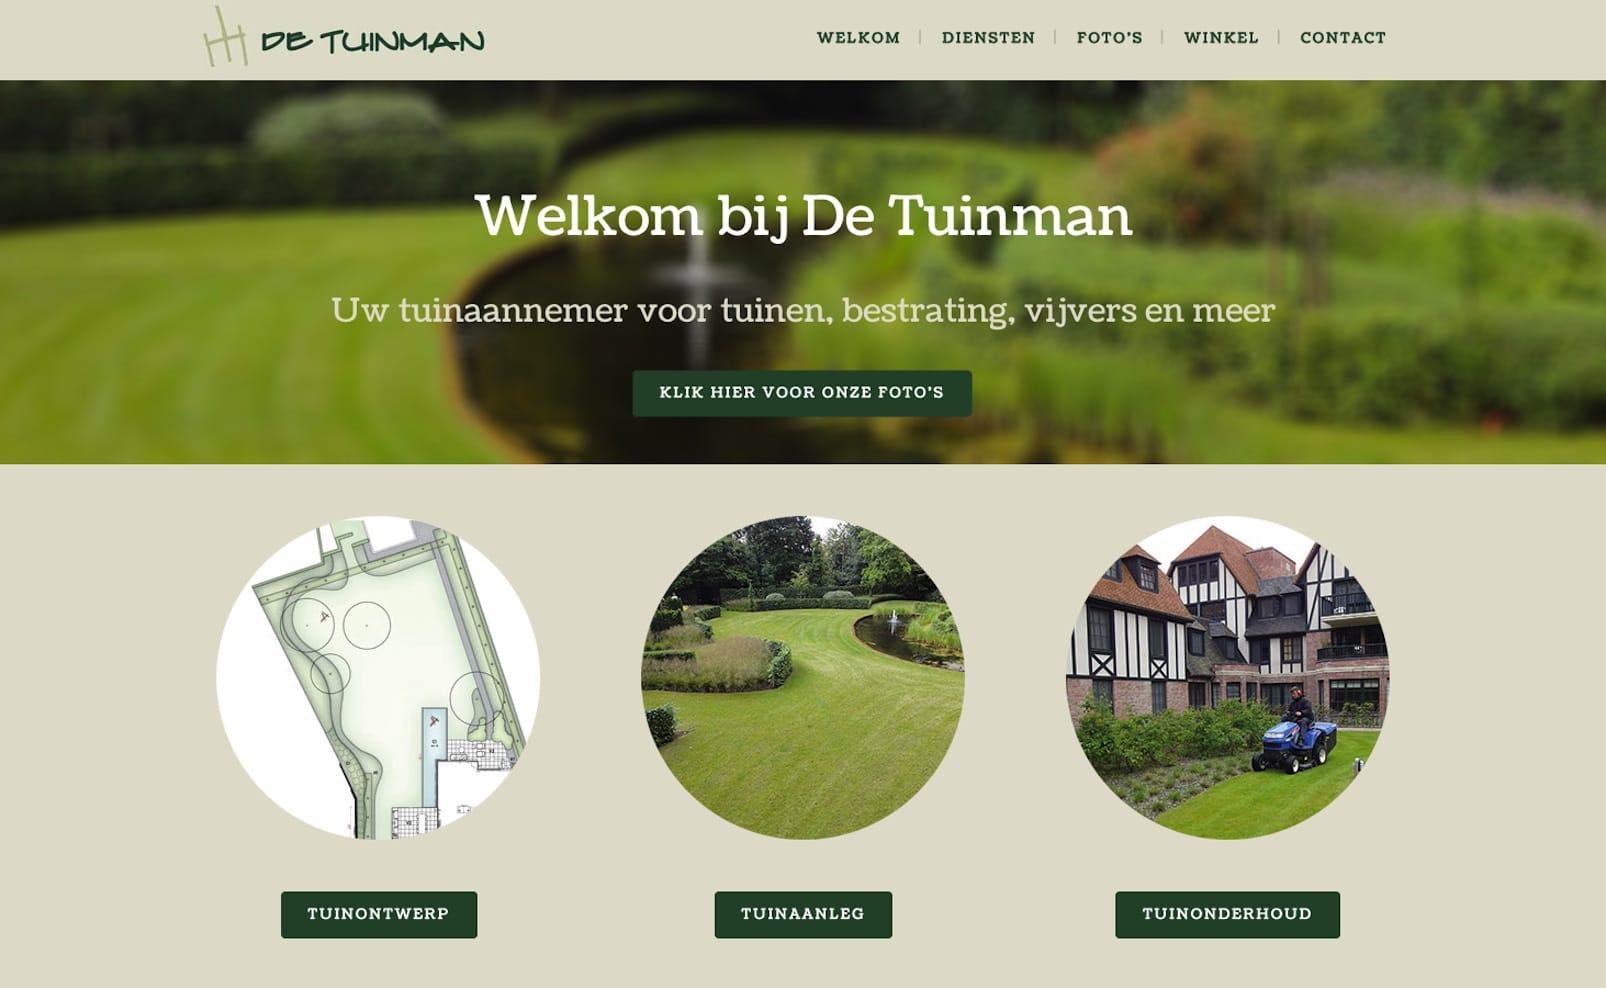 Lincelot Webdesign & marketing - De Tuinman welkom